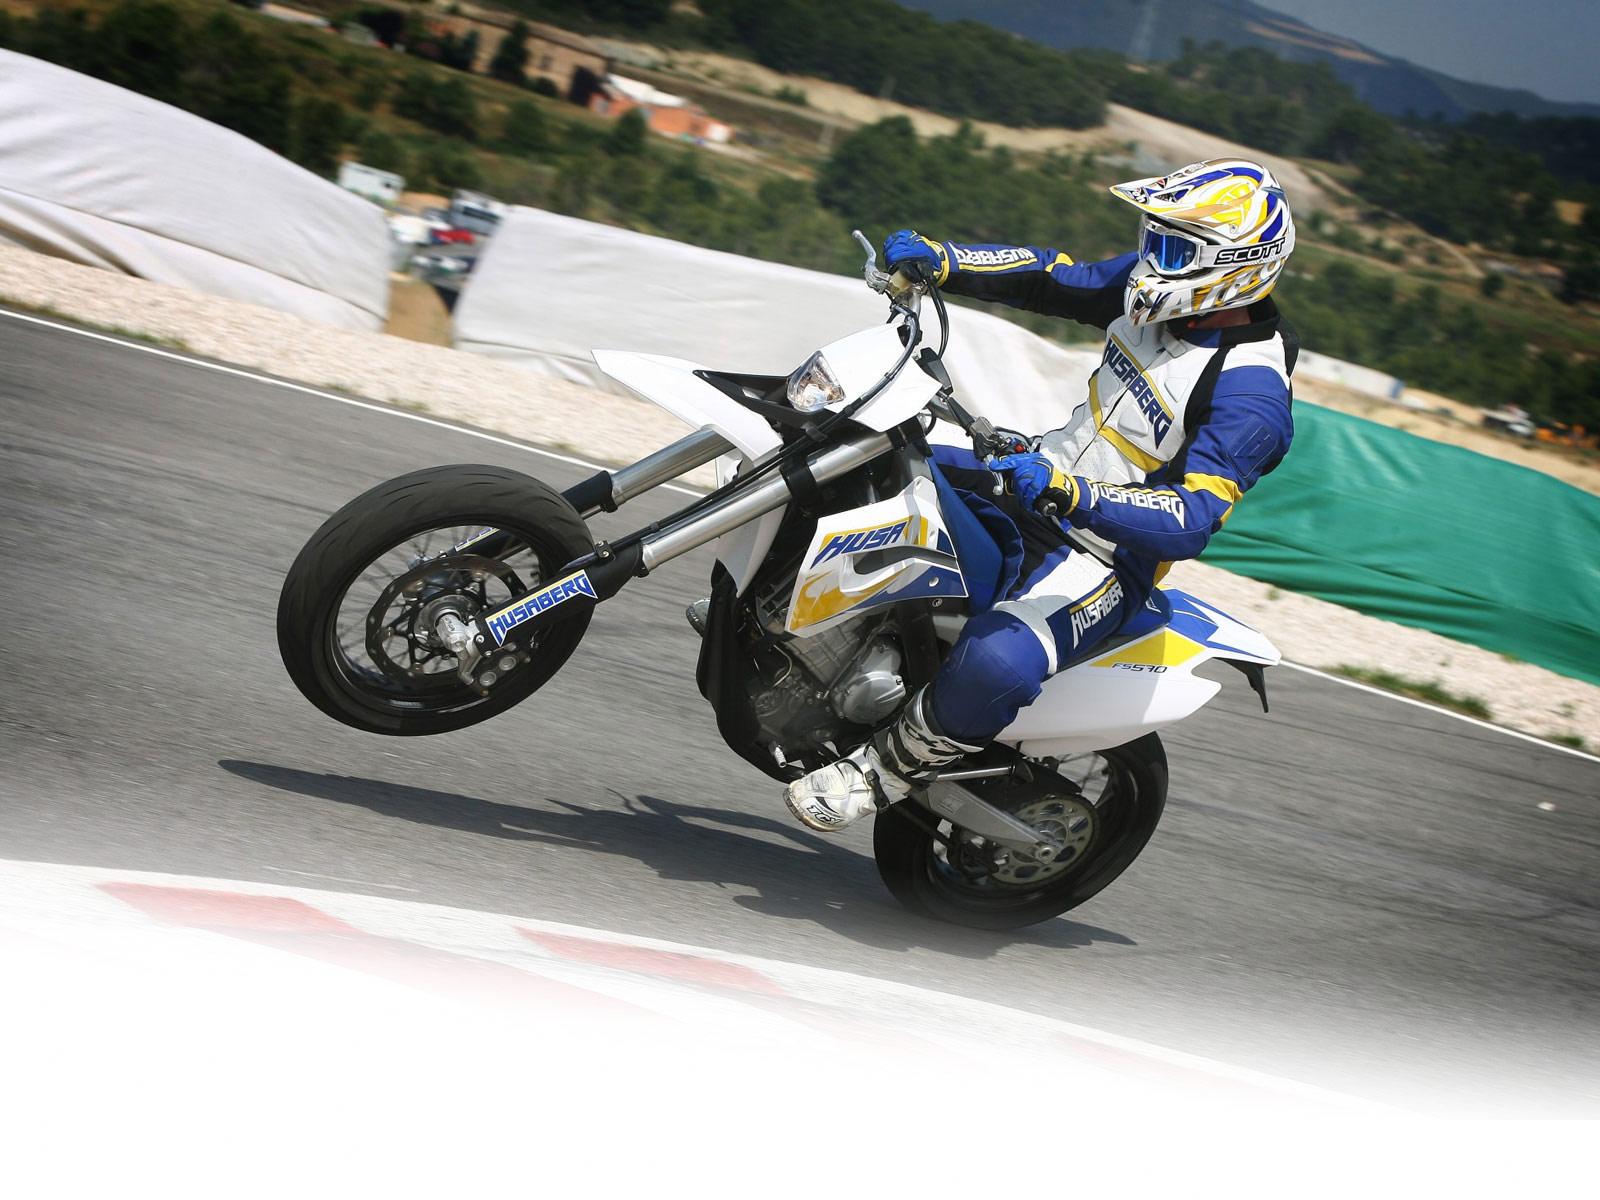 Motorcycles Updates September 2011 Husaberg 570 Wiring Diagram Fs